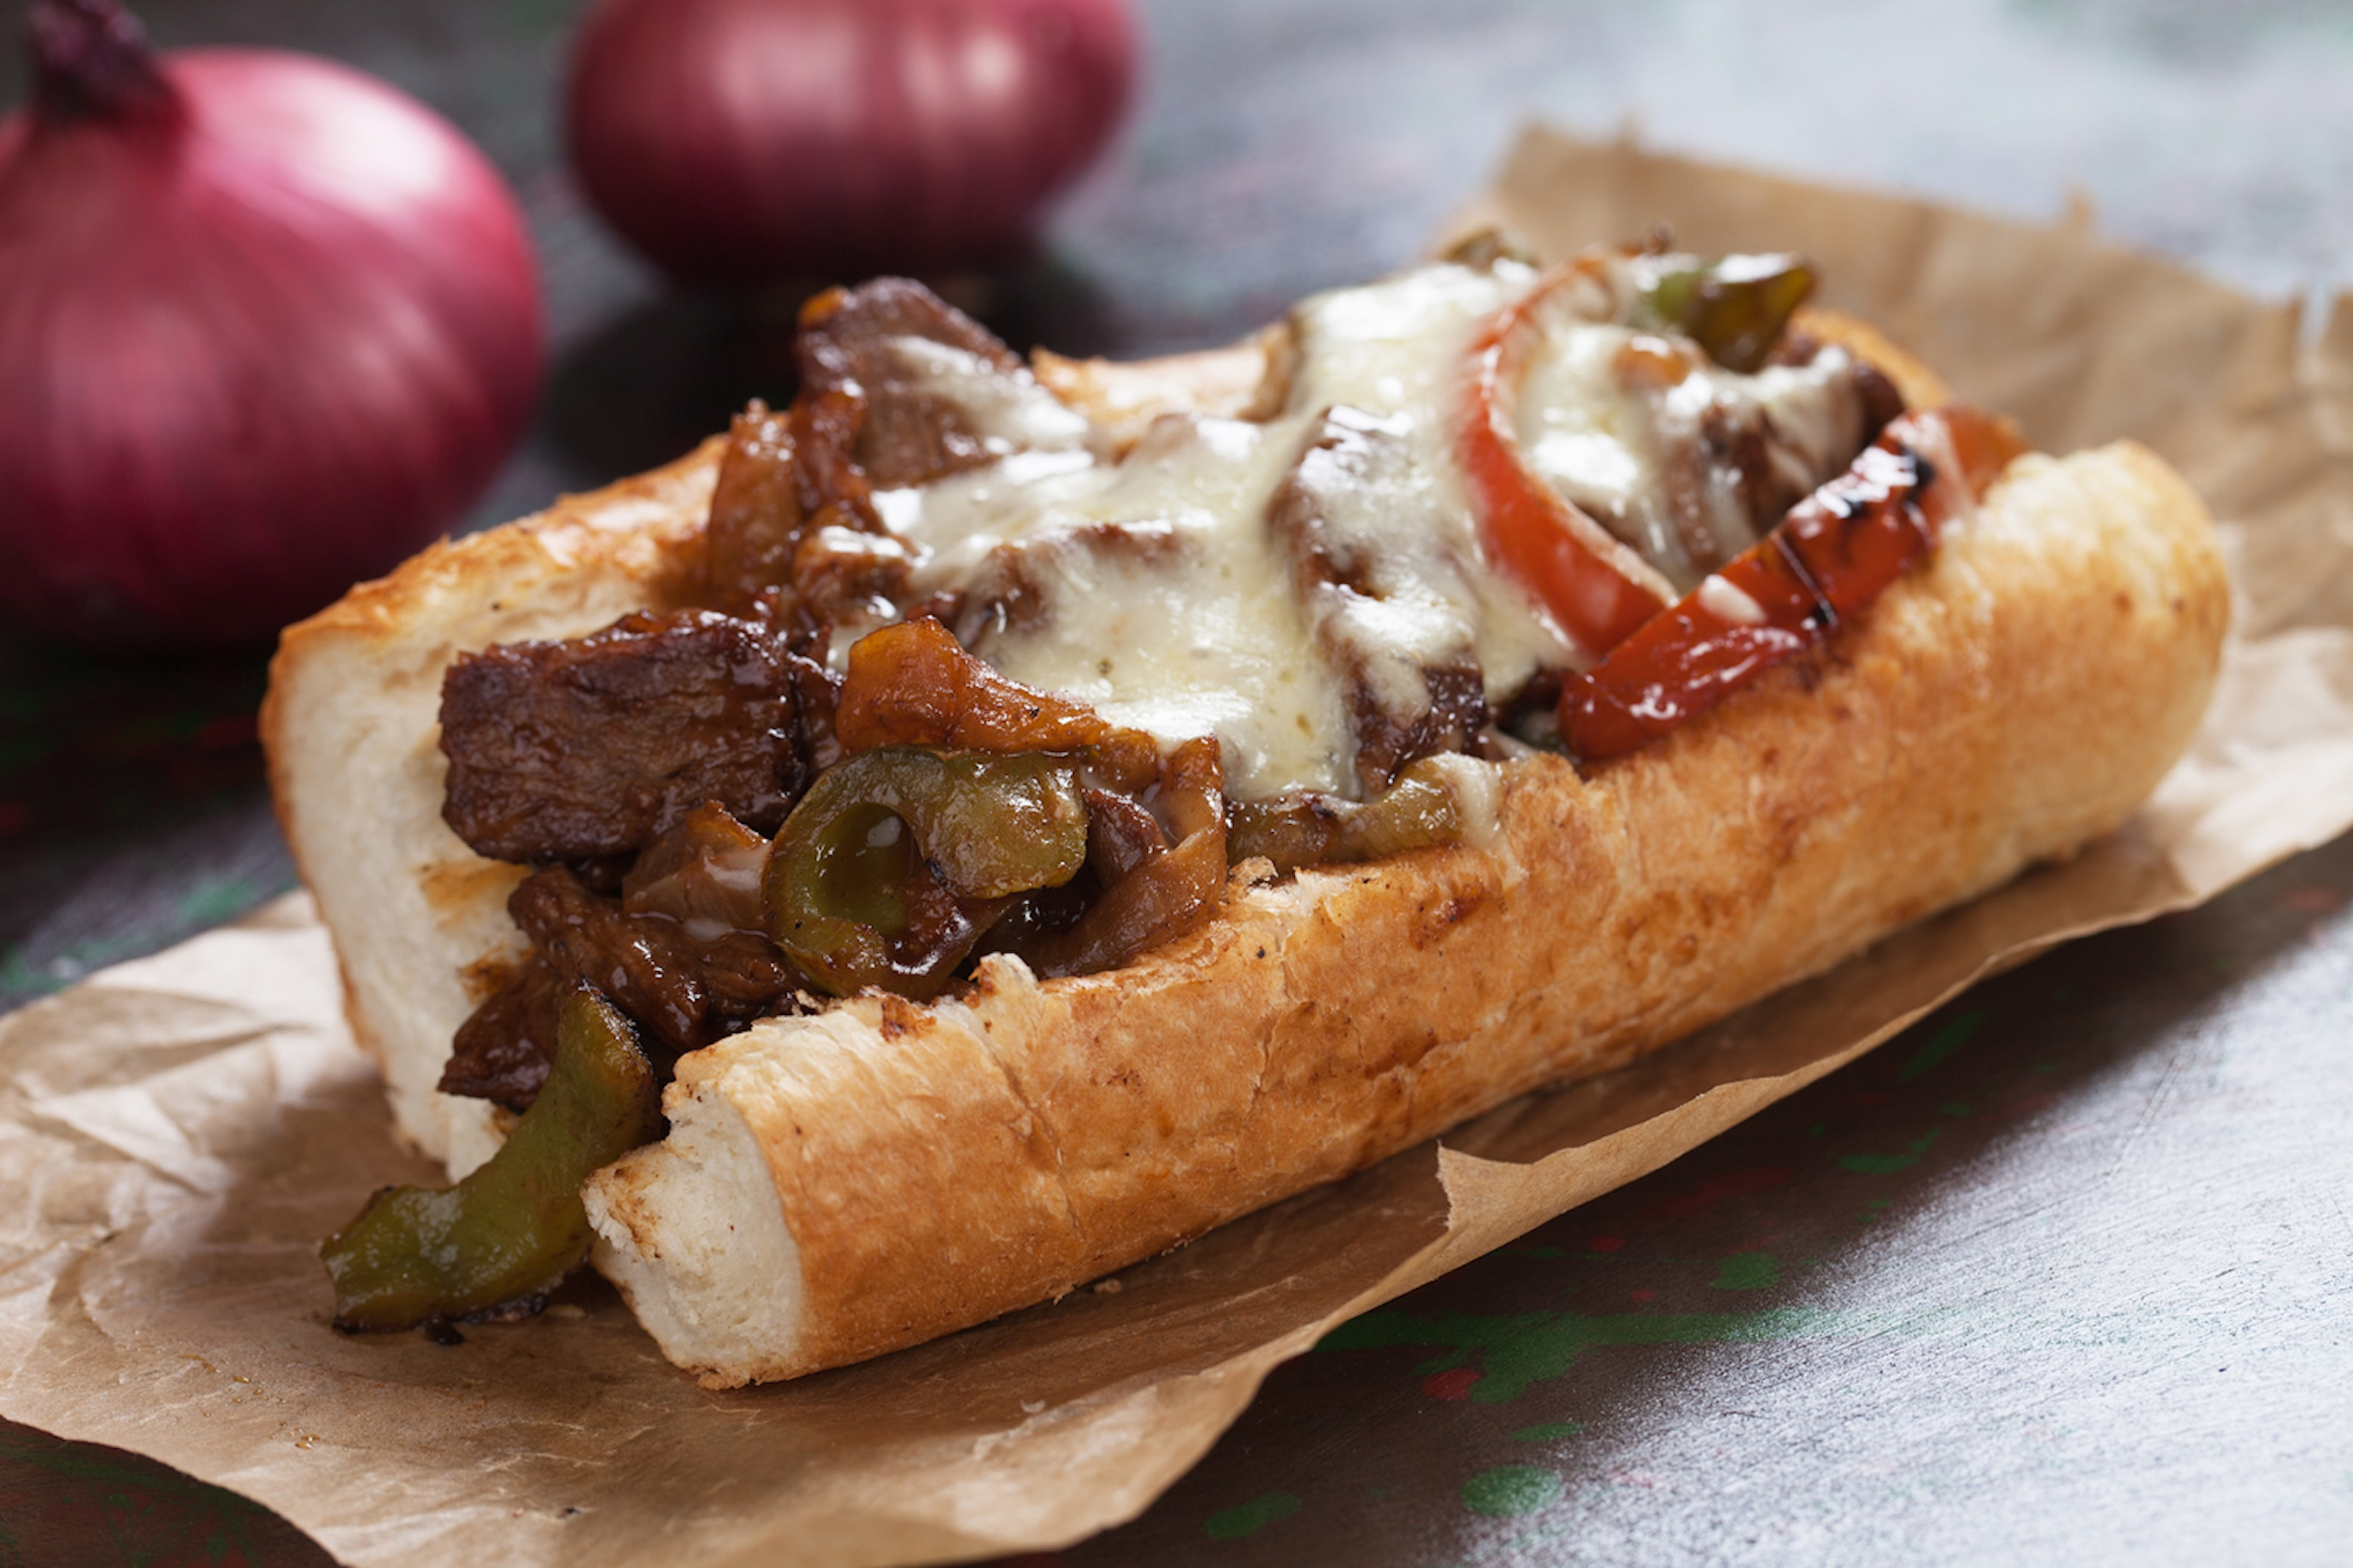 Sandwich hos nyöppnade Steak n cheese & co